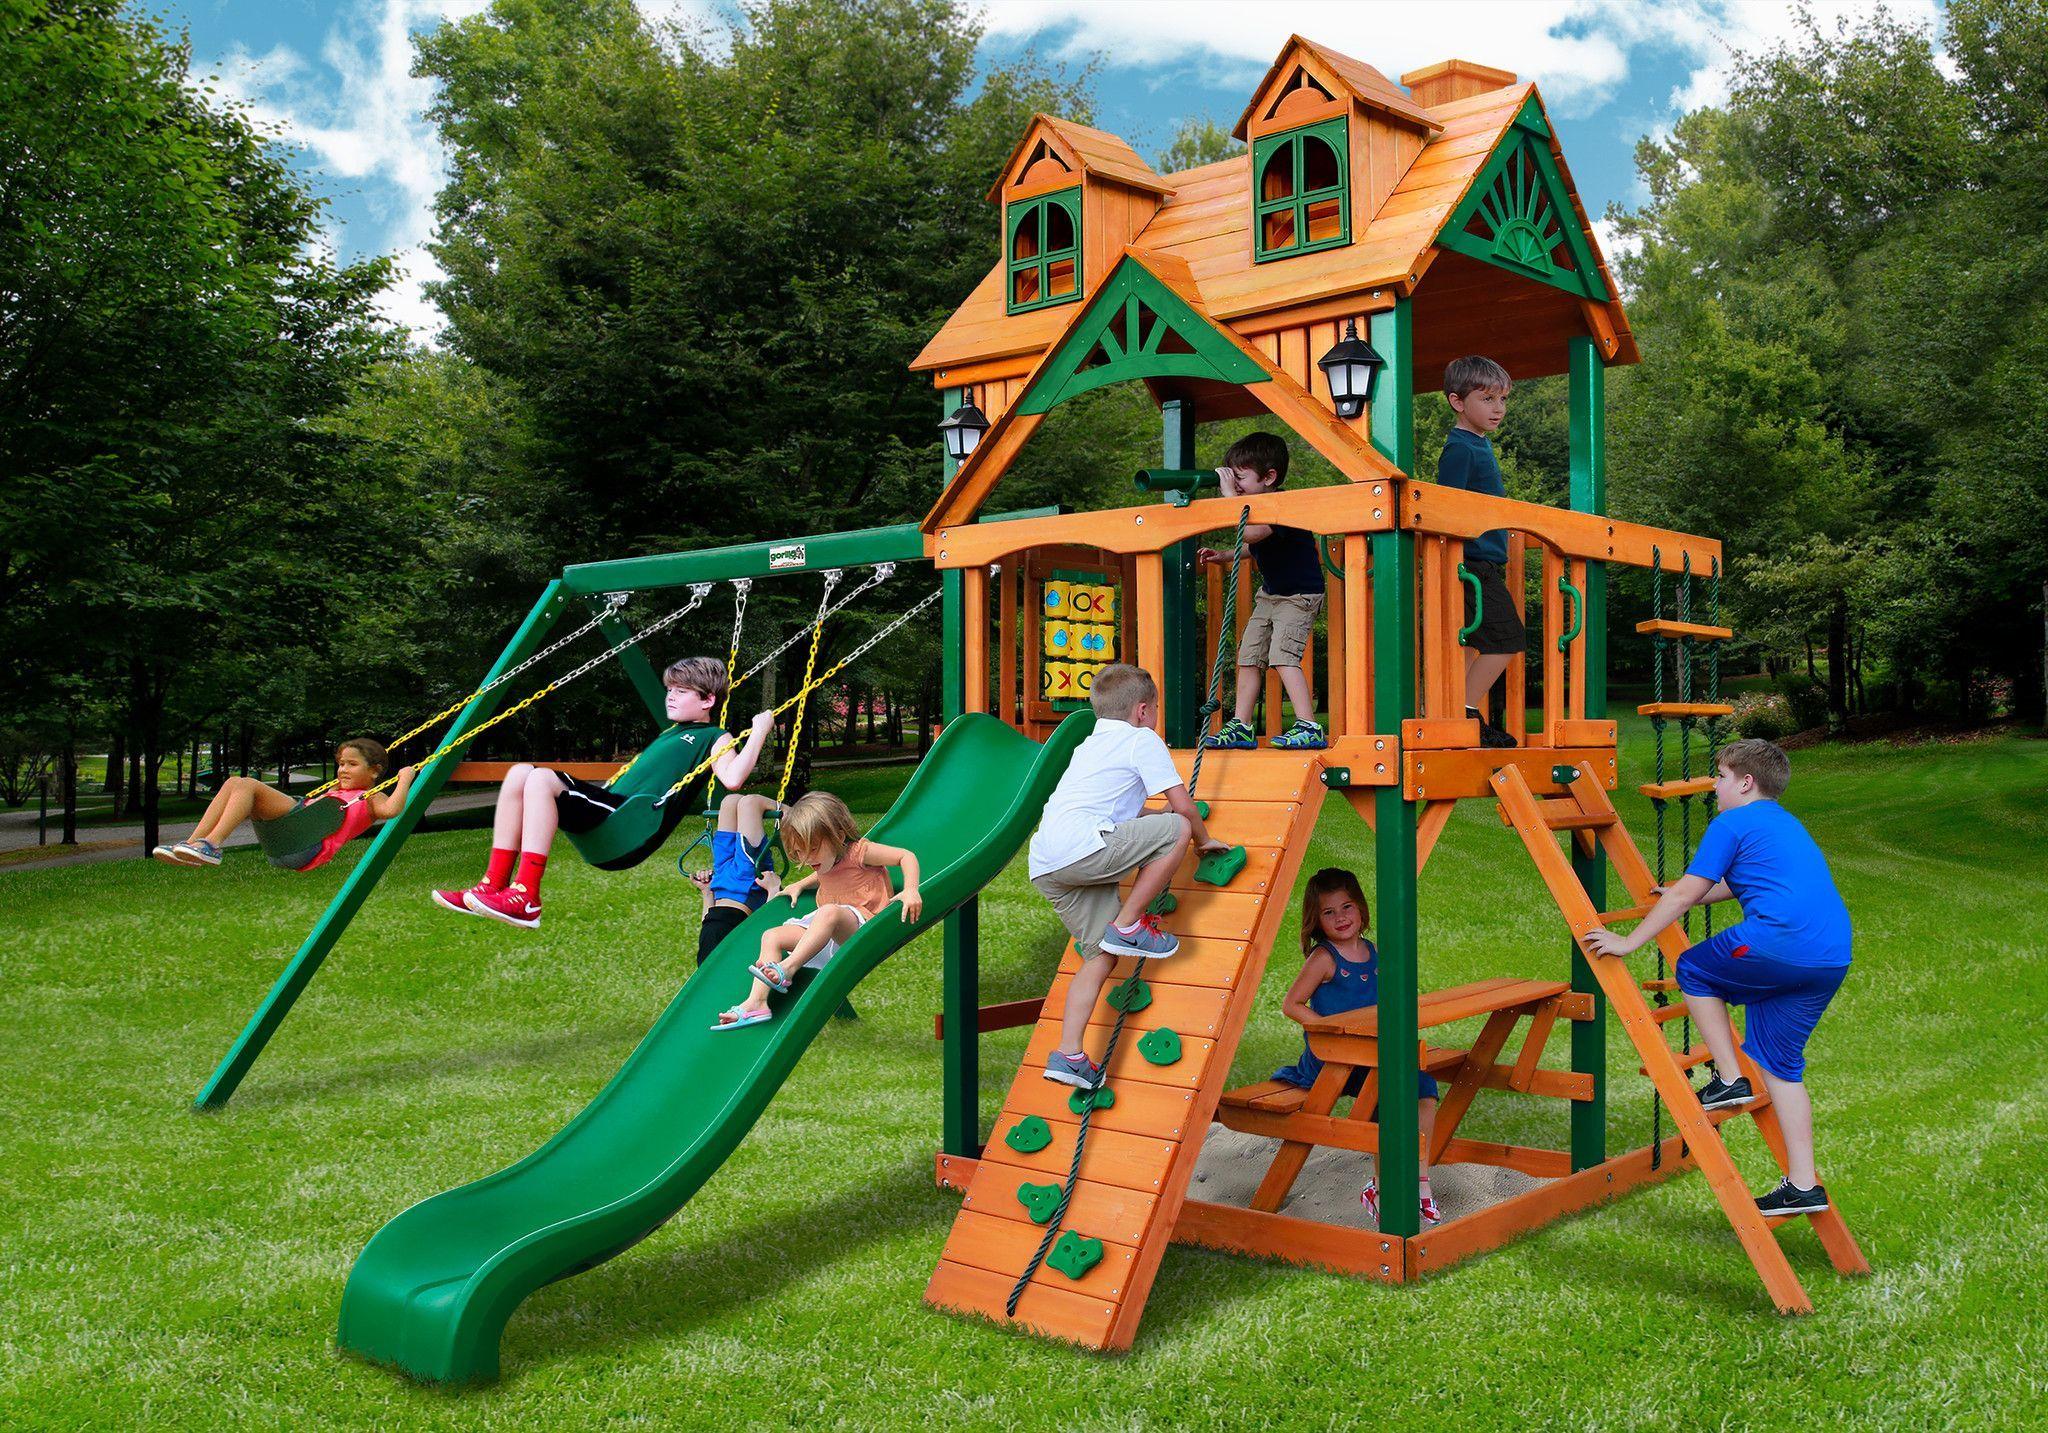 Gorilla playsets chateau wmalibu wood roof swing set wooden